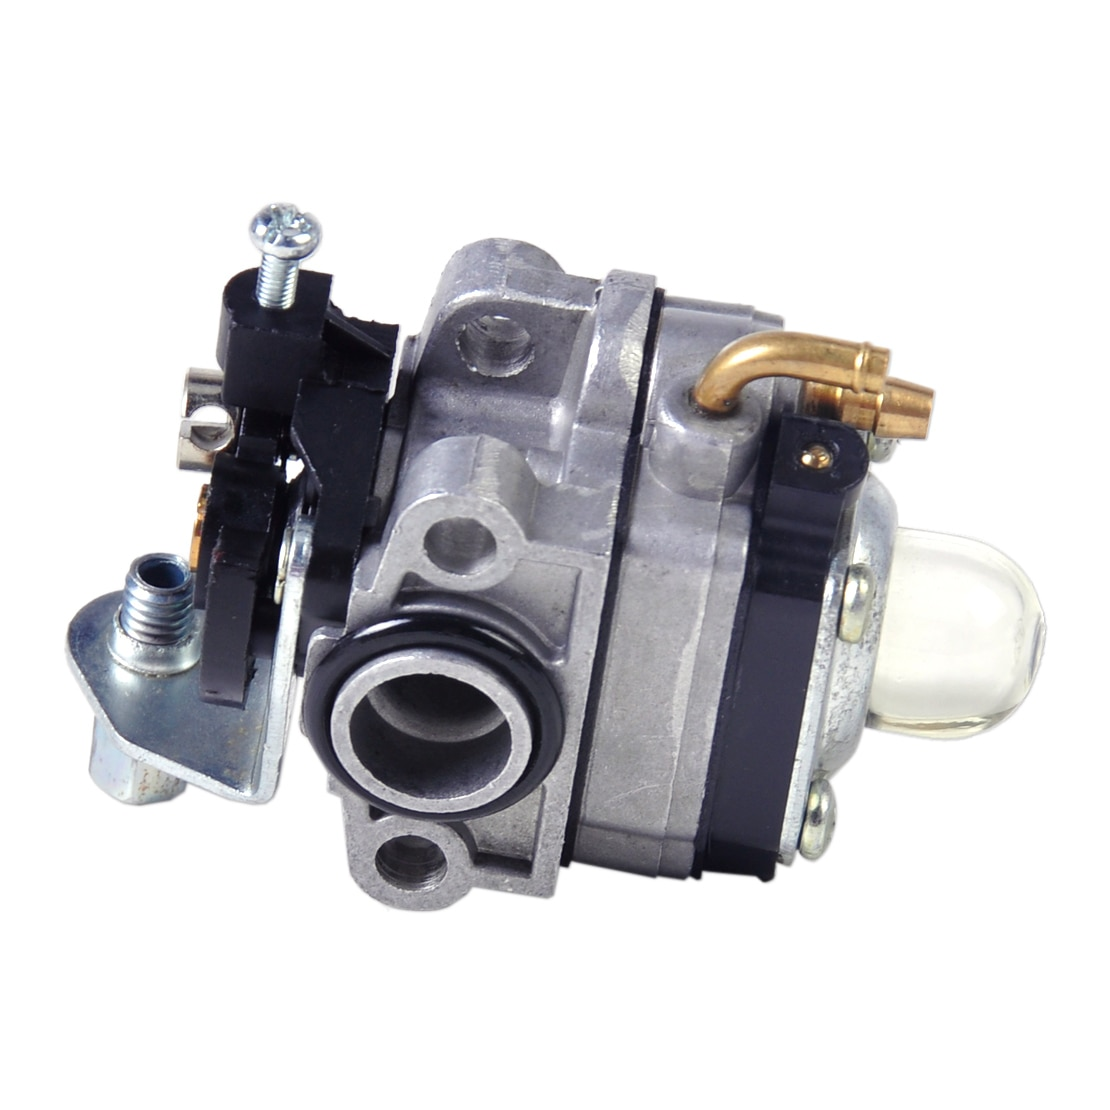 Beler Карбюратор Carb 16100-ZM5-803 I GCA91 для HONDA GX31 GX22 FG100 HHE31C Edger HHT31S WX10 водяной насос 4 мотоблоки двигателя